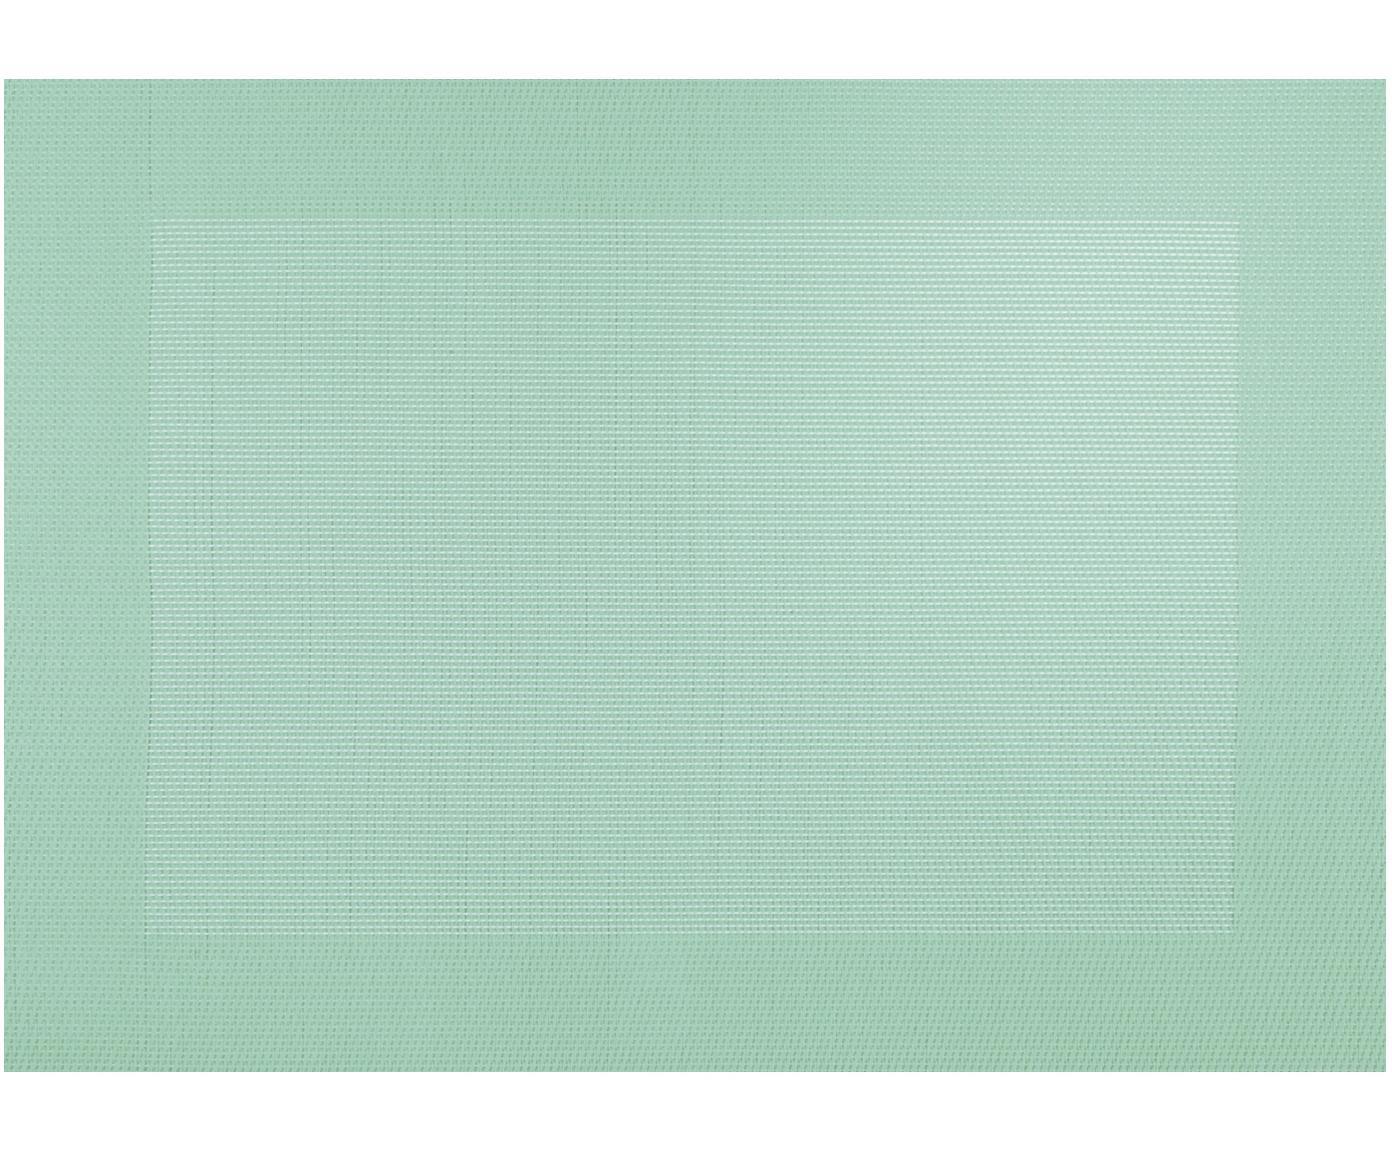 Kunststoff-Tischsets Trefl, 2 Stück, Kunststoff (PVC), Mintgrün, 33 x 46 cm